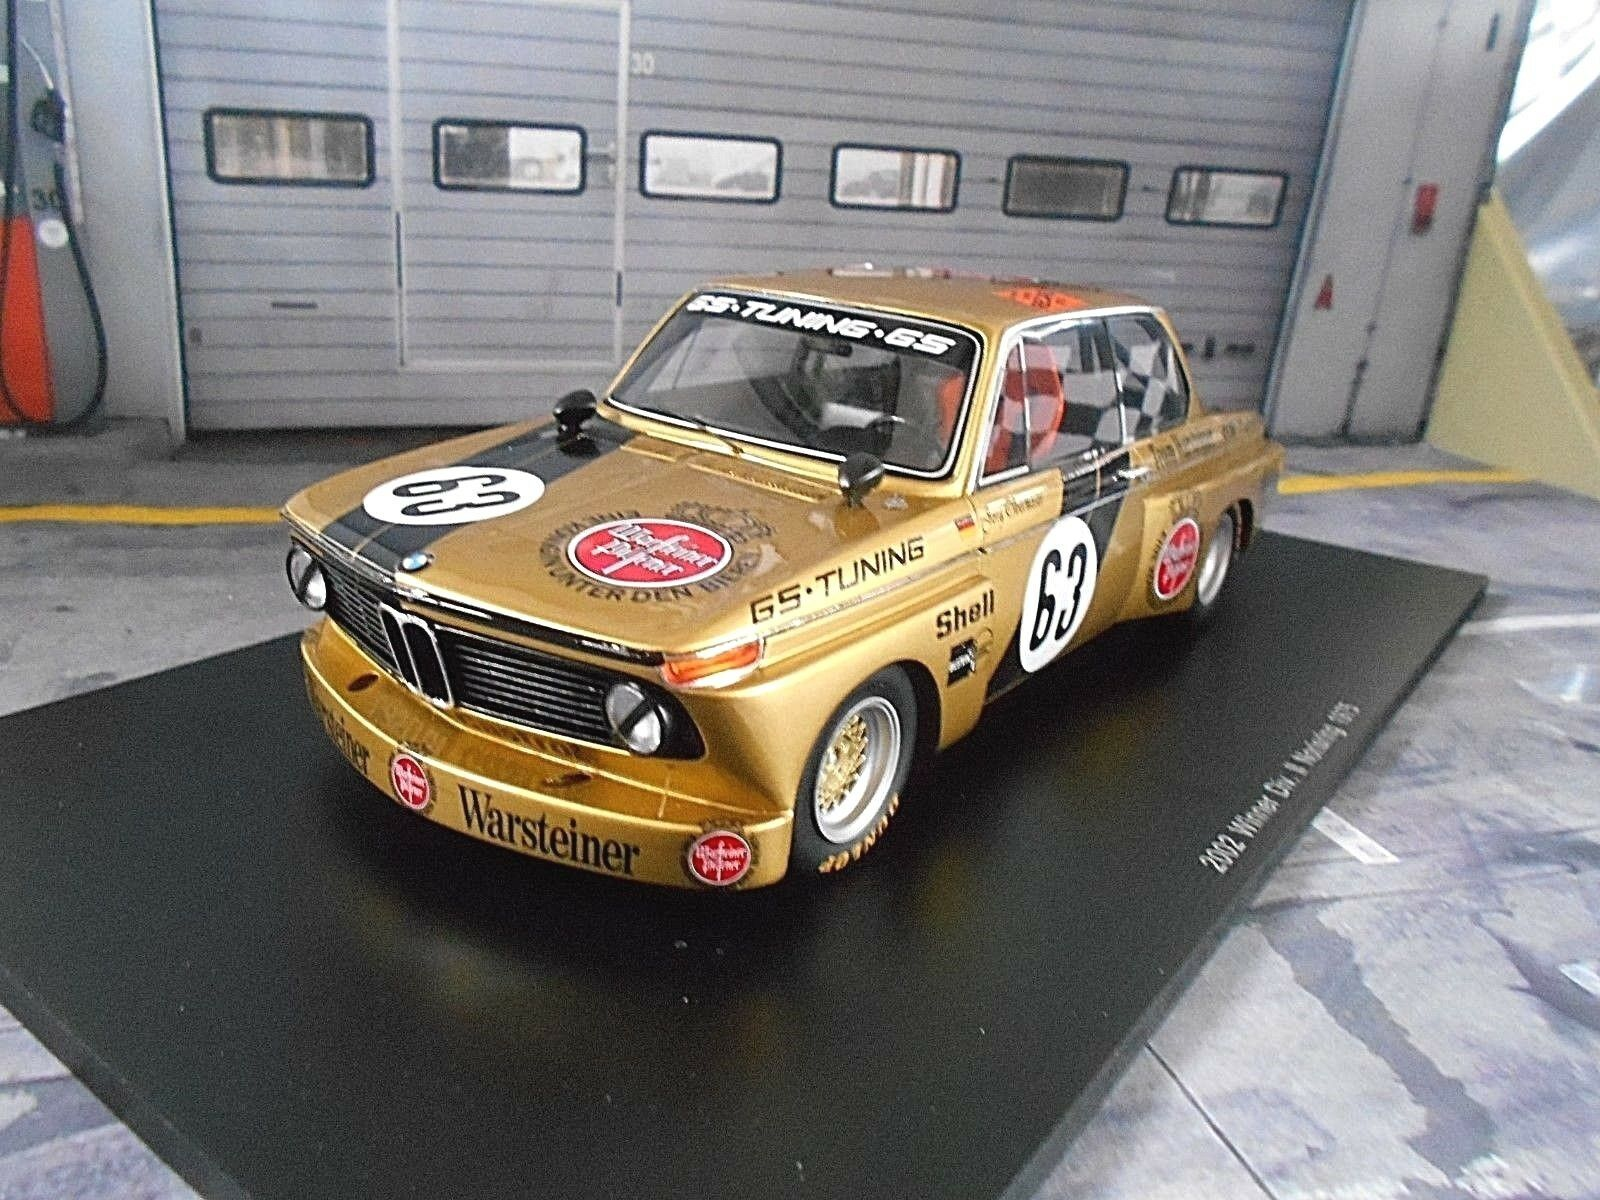 Bmw 2002 racing DRM eras una equipo GS  63 Ober Moser Norisring 1975 Spark 1 18